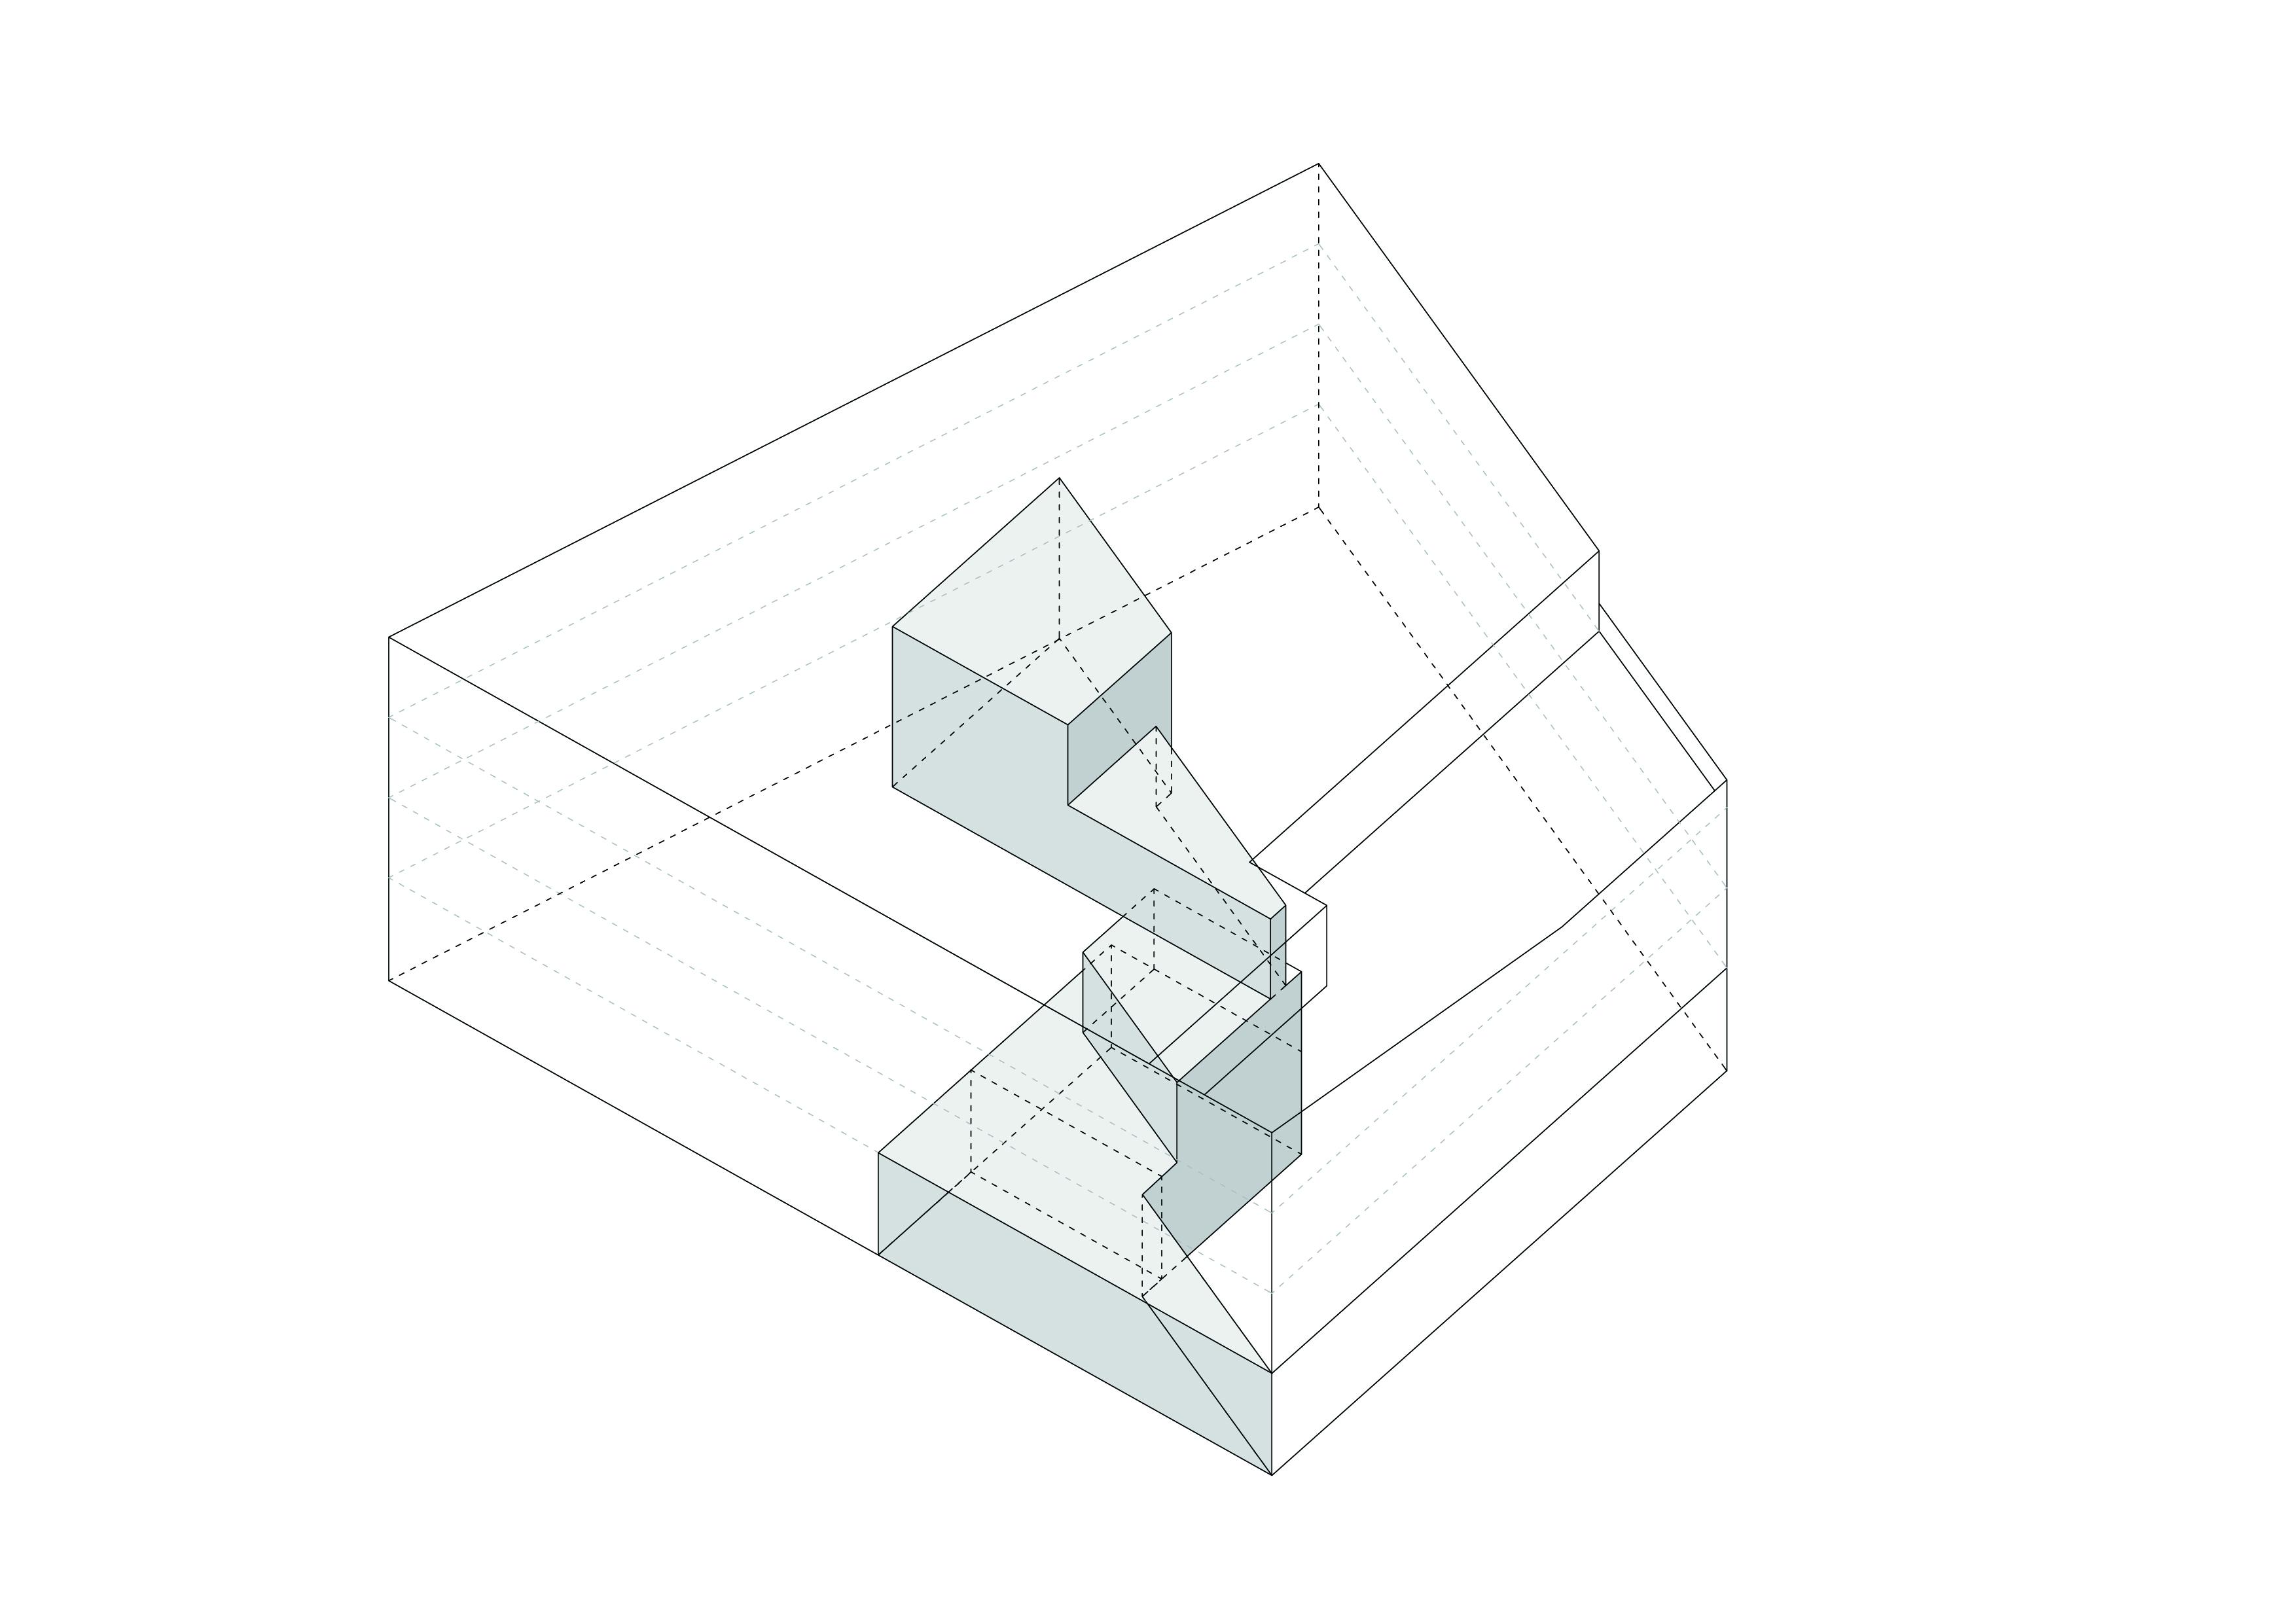 Sala Ferusic Architects Foam Carles Sala Relja Ferusic